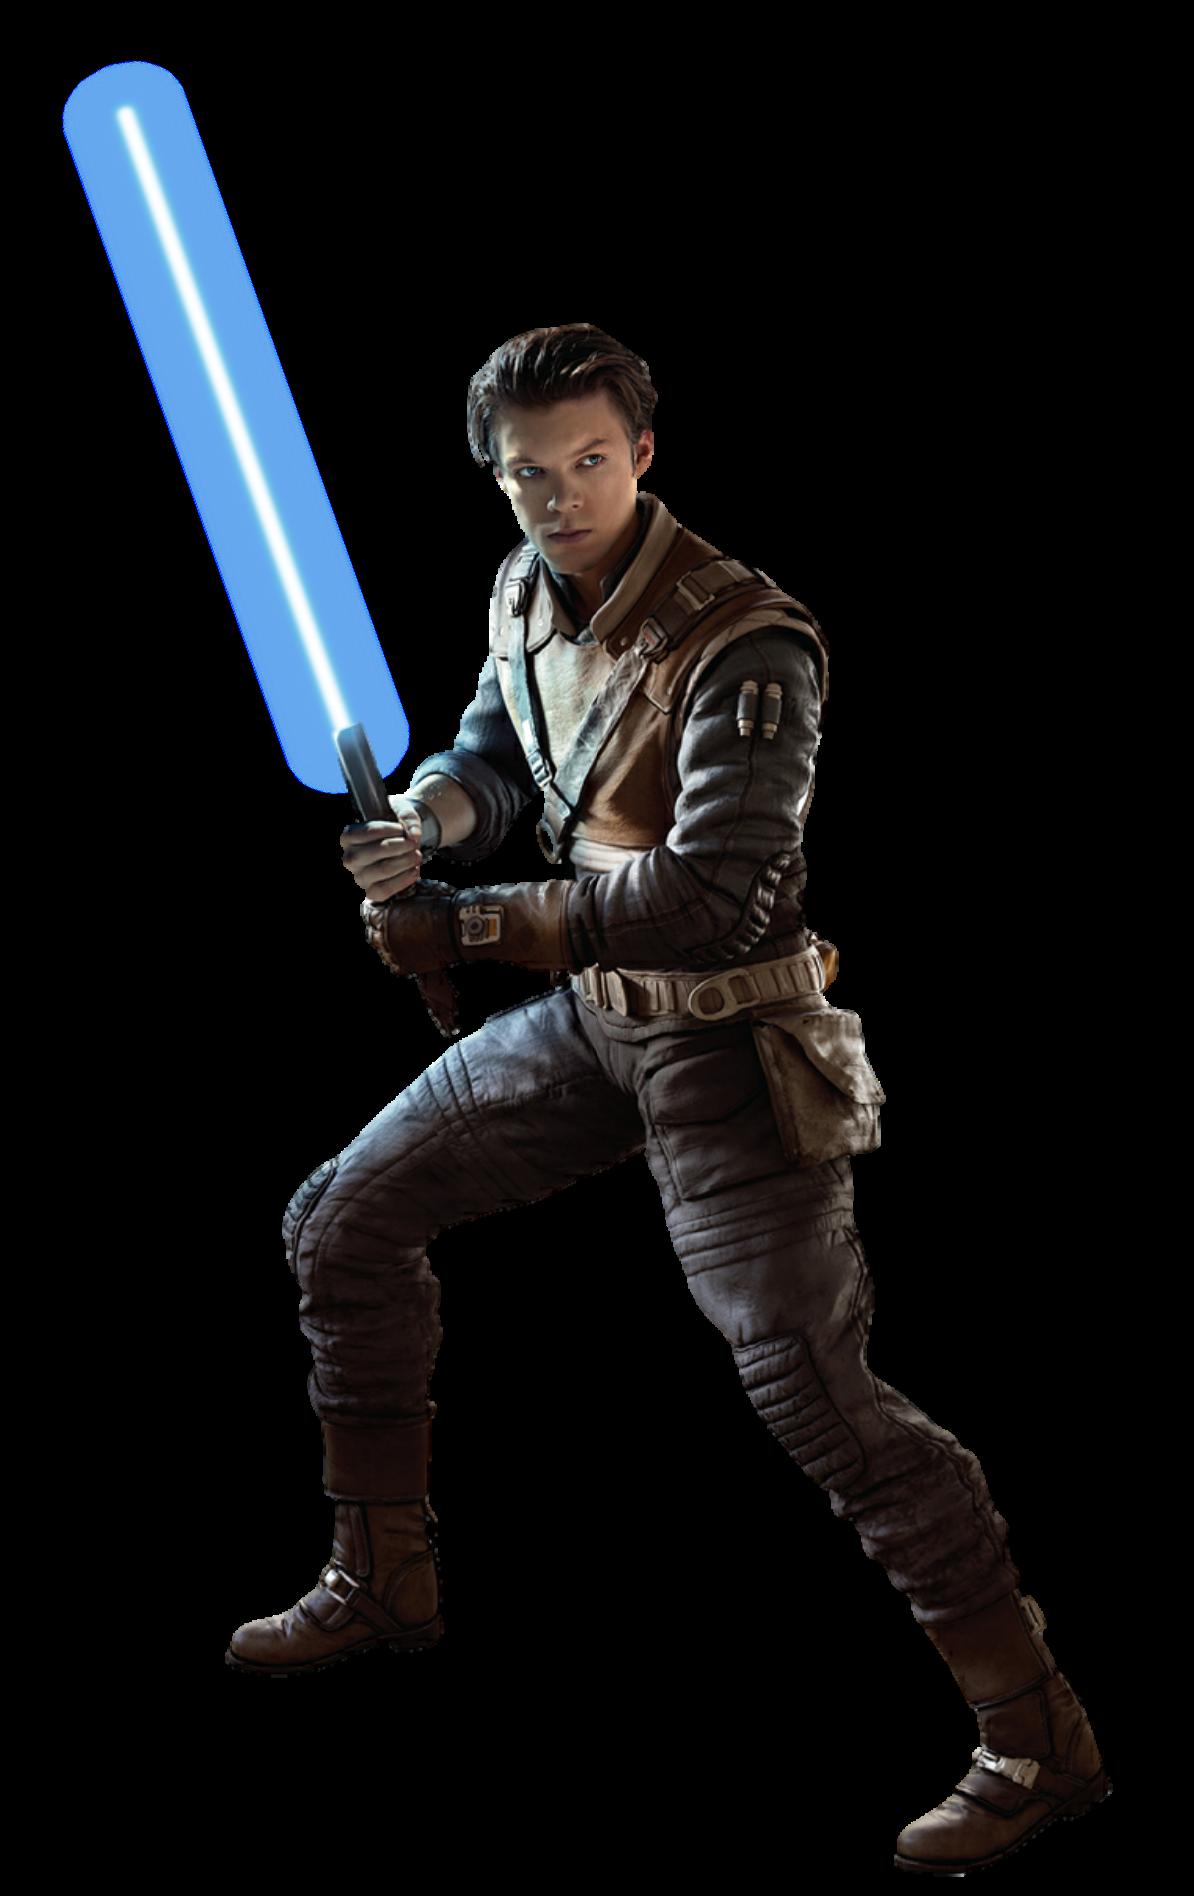 Star Wars Jedi Fallen Order Cal Kestis Png By Metropolis Hero1125 On Deviantart Star Wars Jedi Star Wars Fallen Order Star Wars